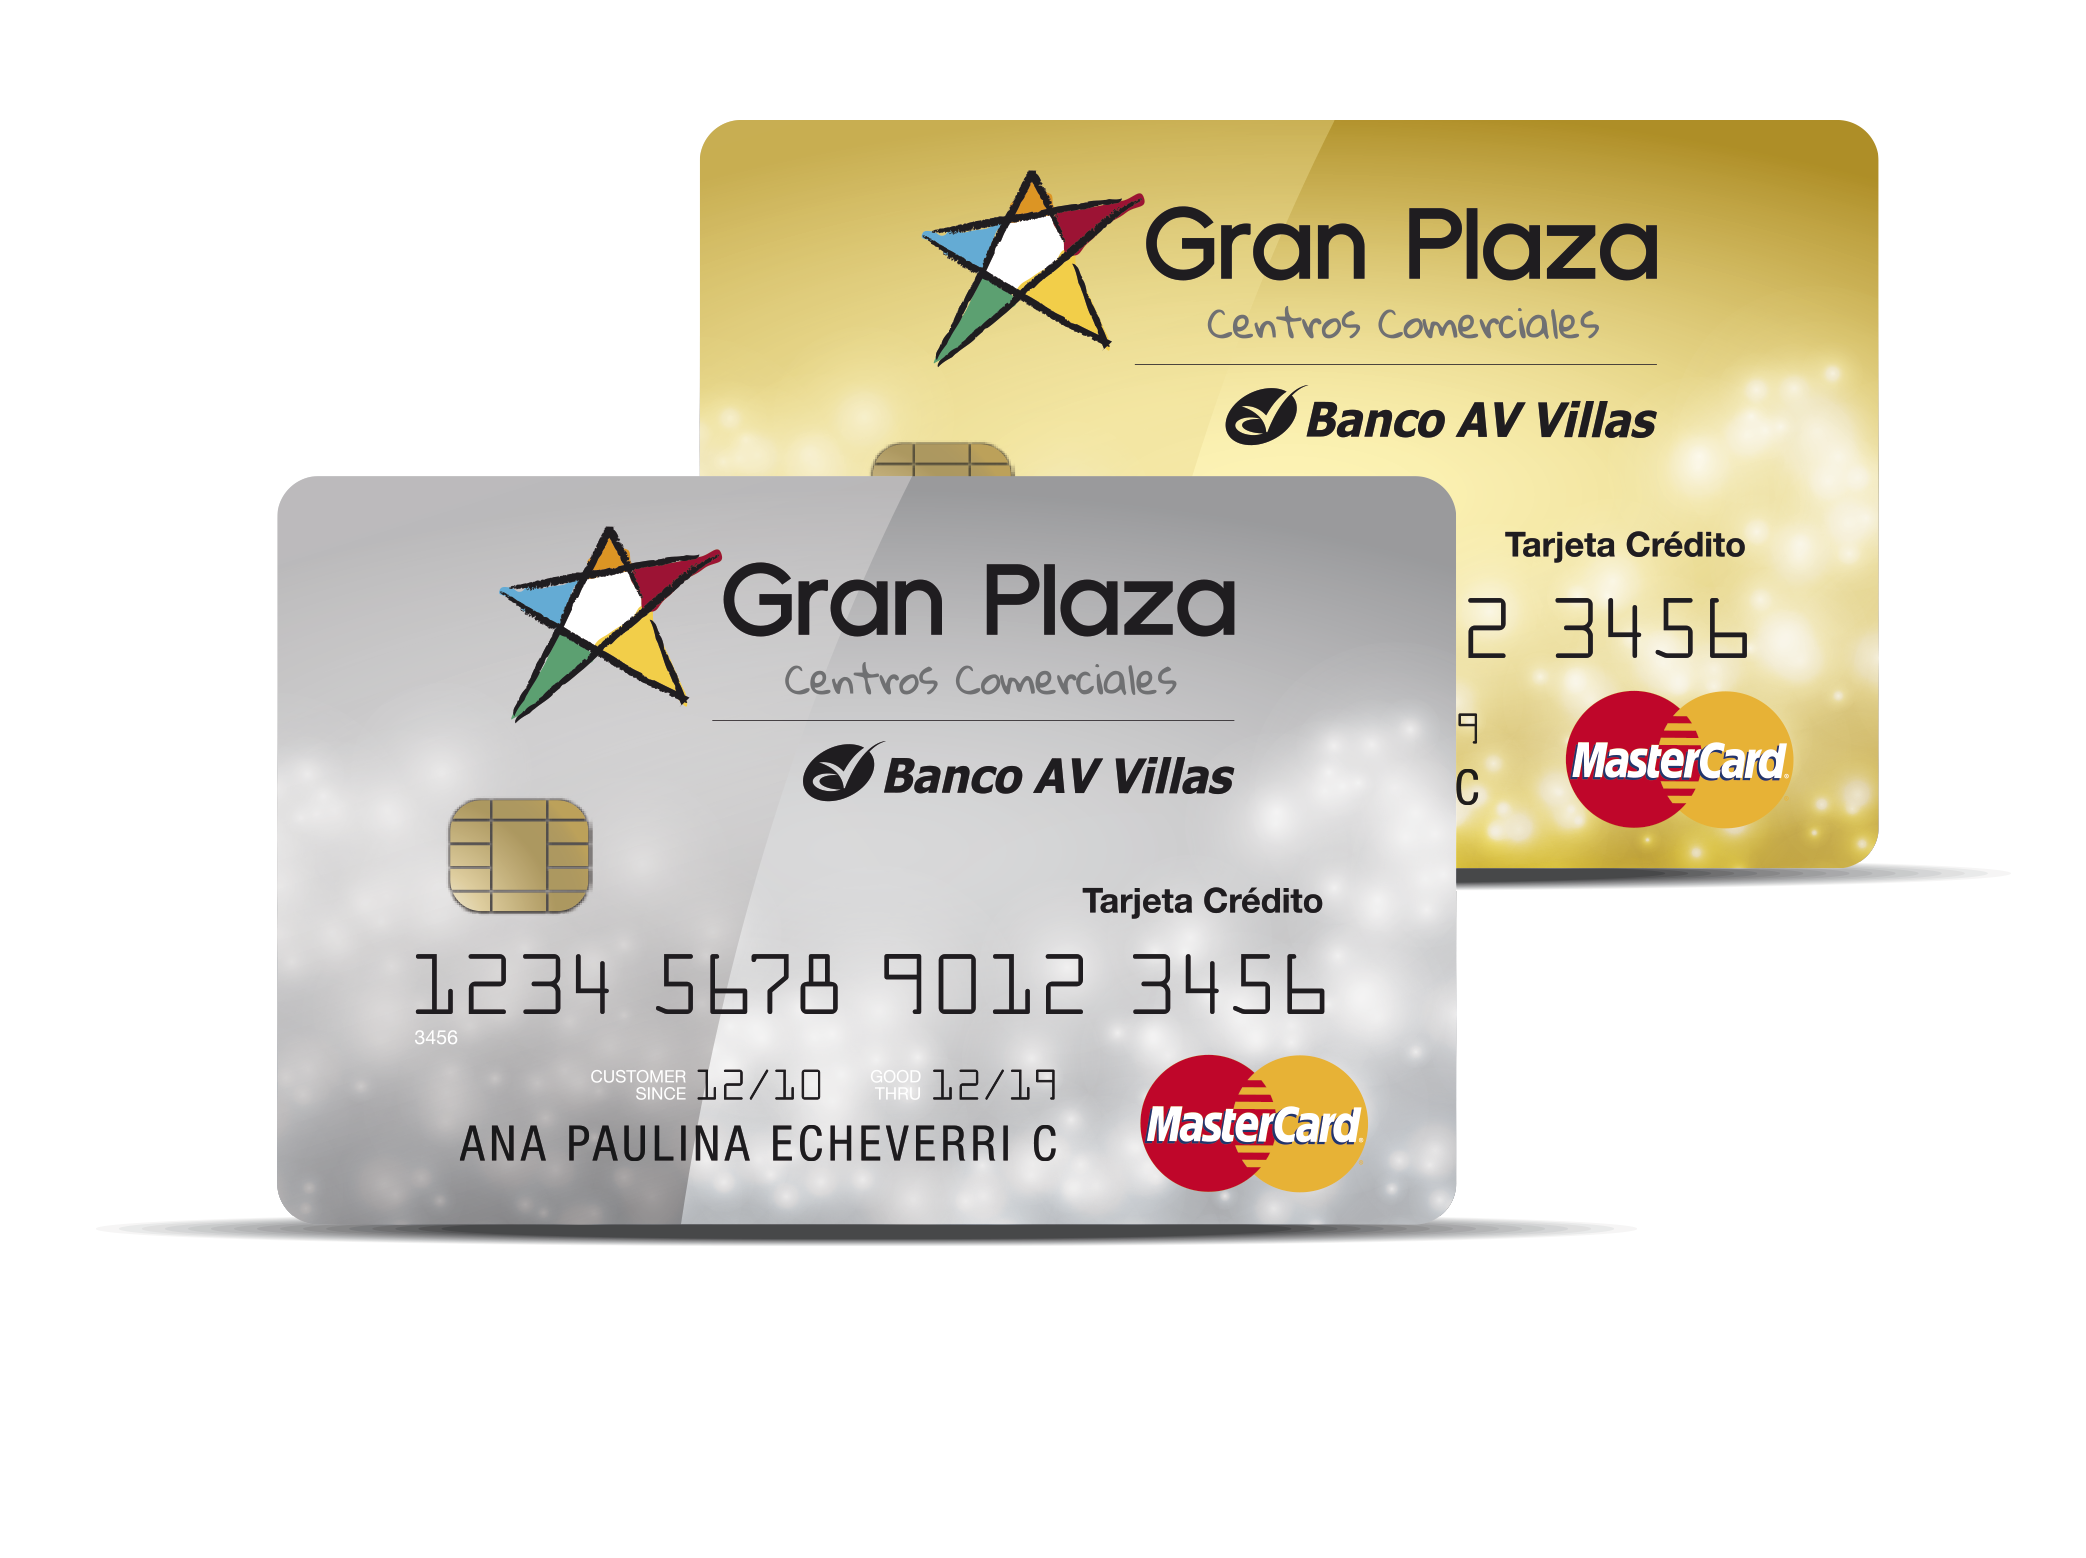 Tarjeta de Crédito Gran Plaza: Banco AV Villas